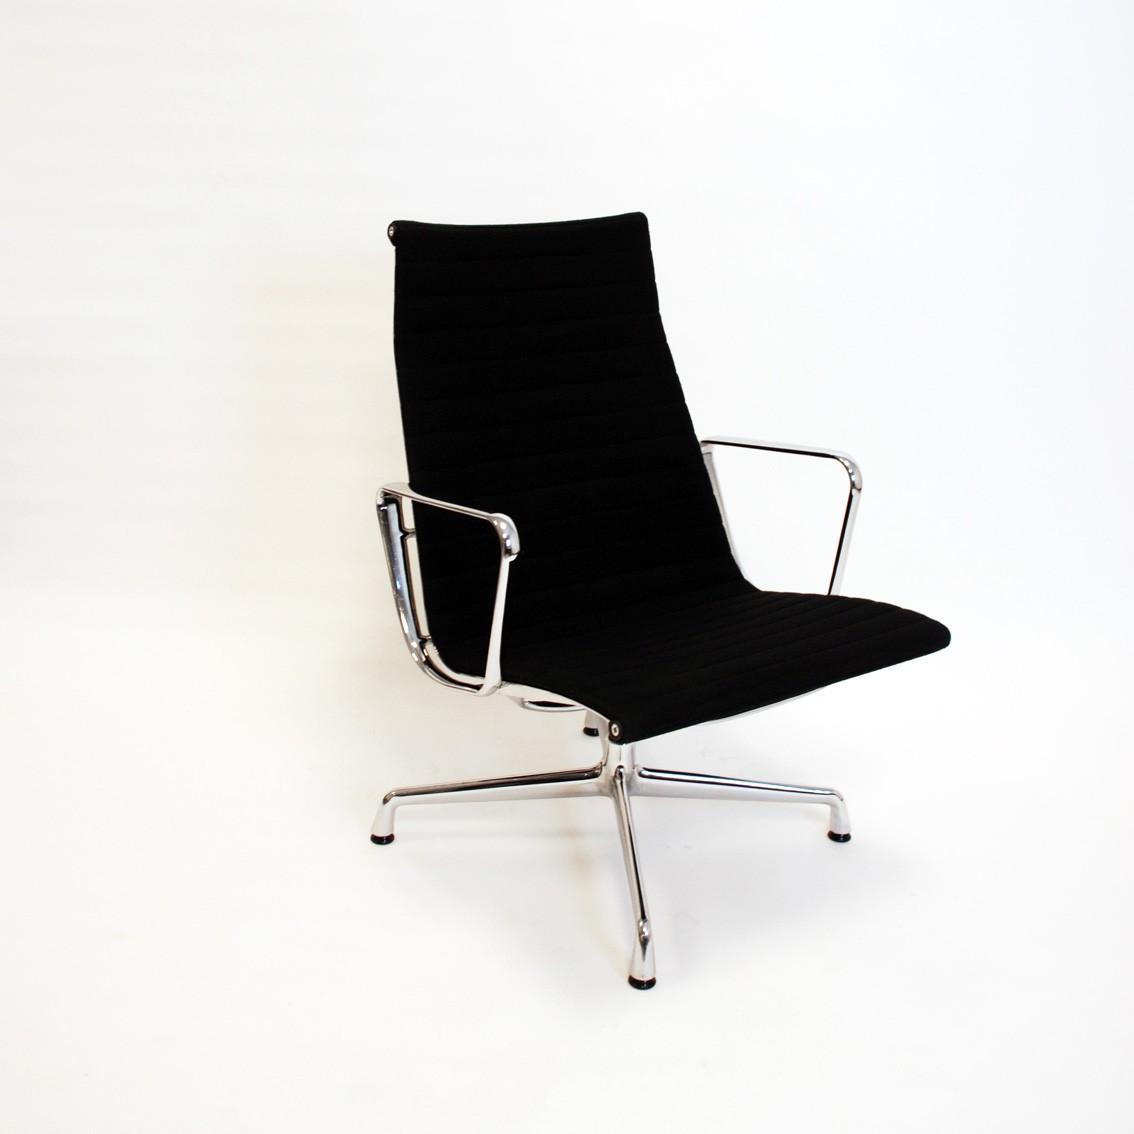 vitra stuhl gnstig awesome vitra headline gebraucht grau stoff mit armlehnen brostuhl garantie. Black Bedroom Furniture Sets. Home Design Ideas